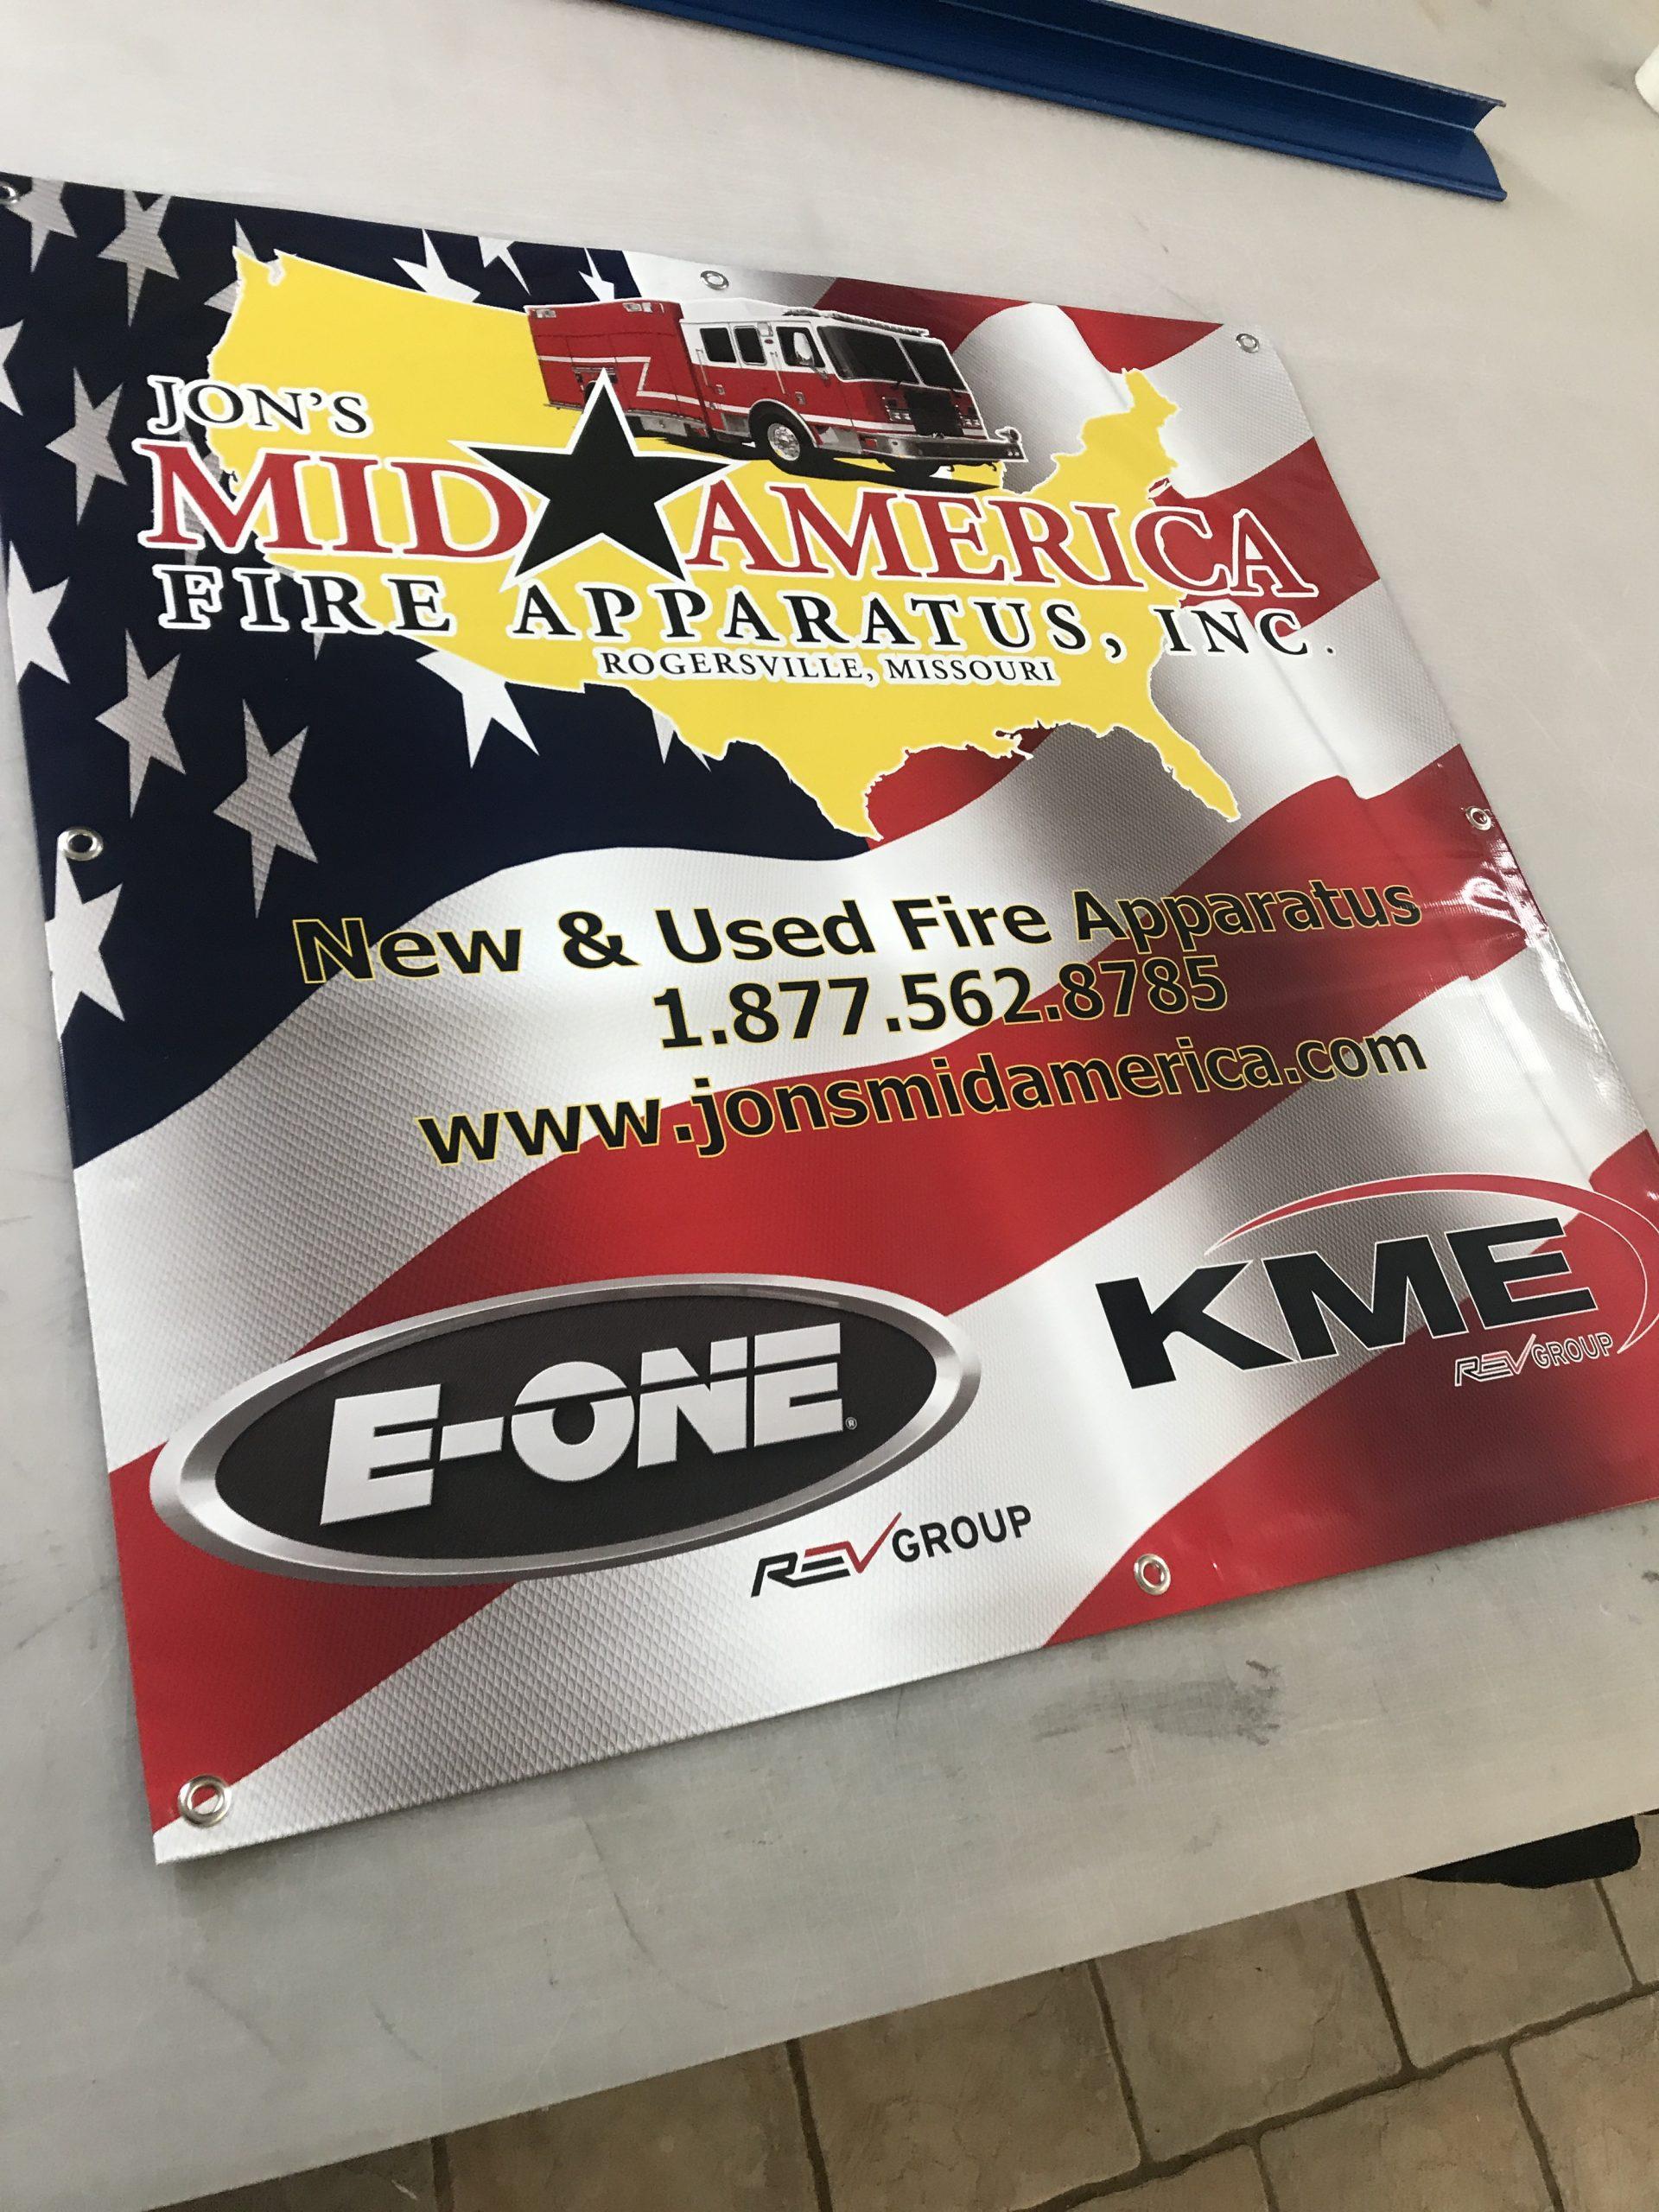 Mid America Fire Apparatus